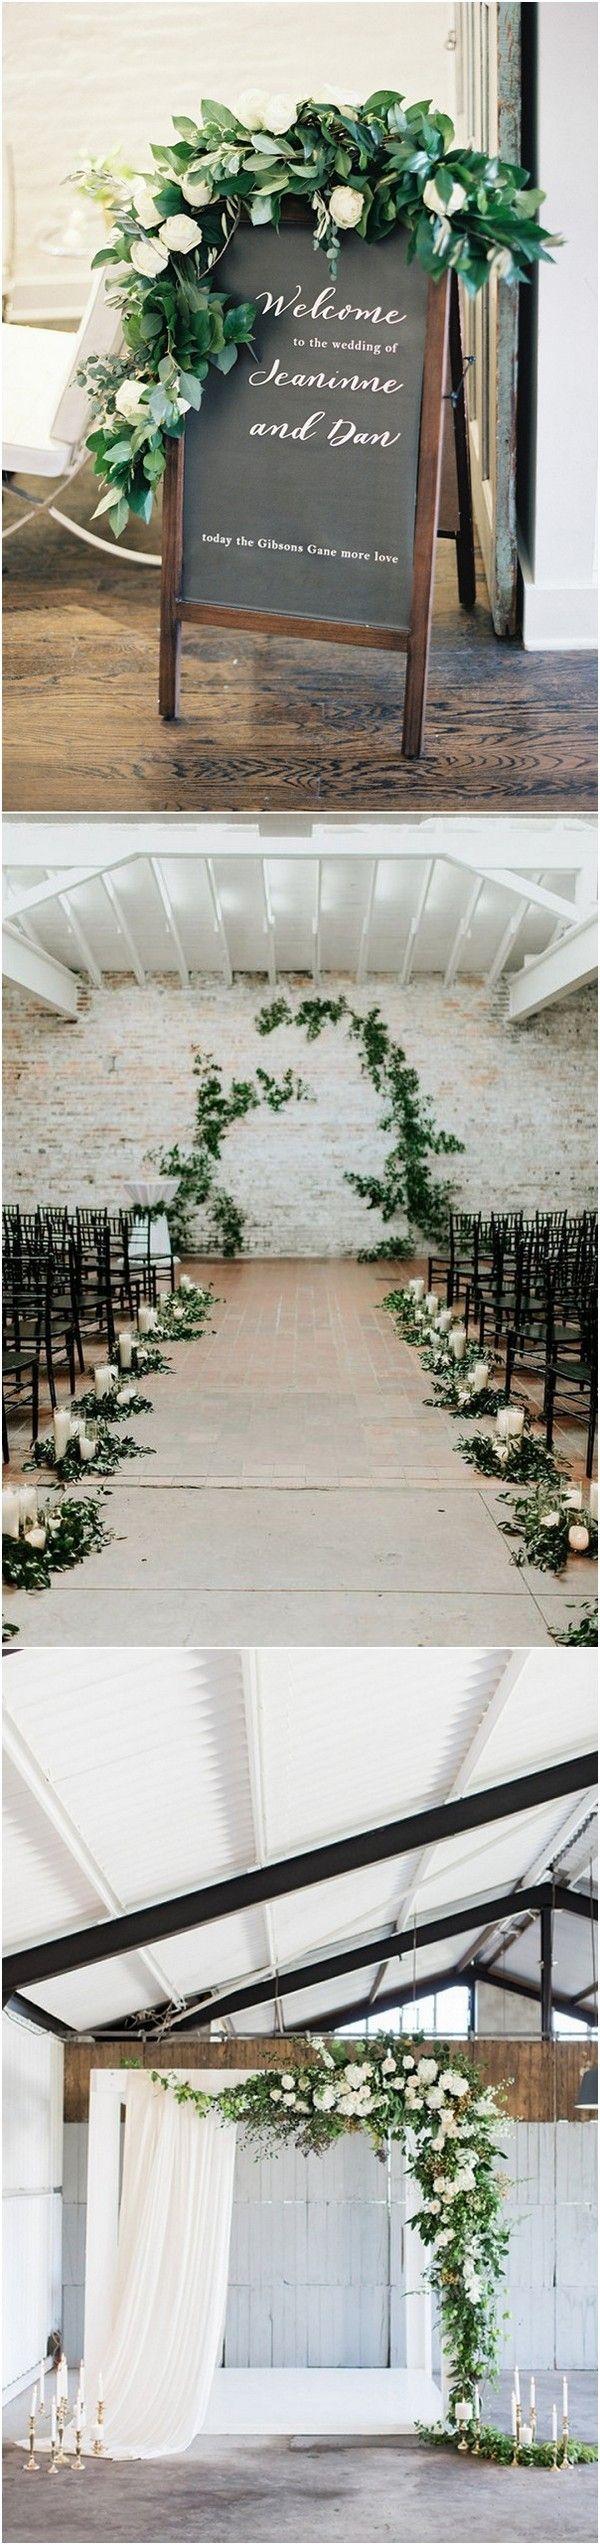 greenery wedding ceremony decoration ideas 2018 trends